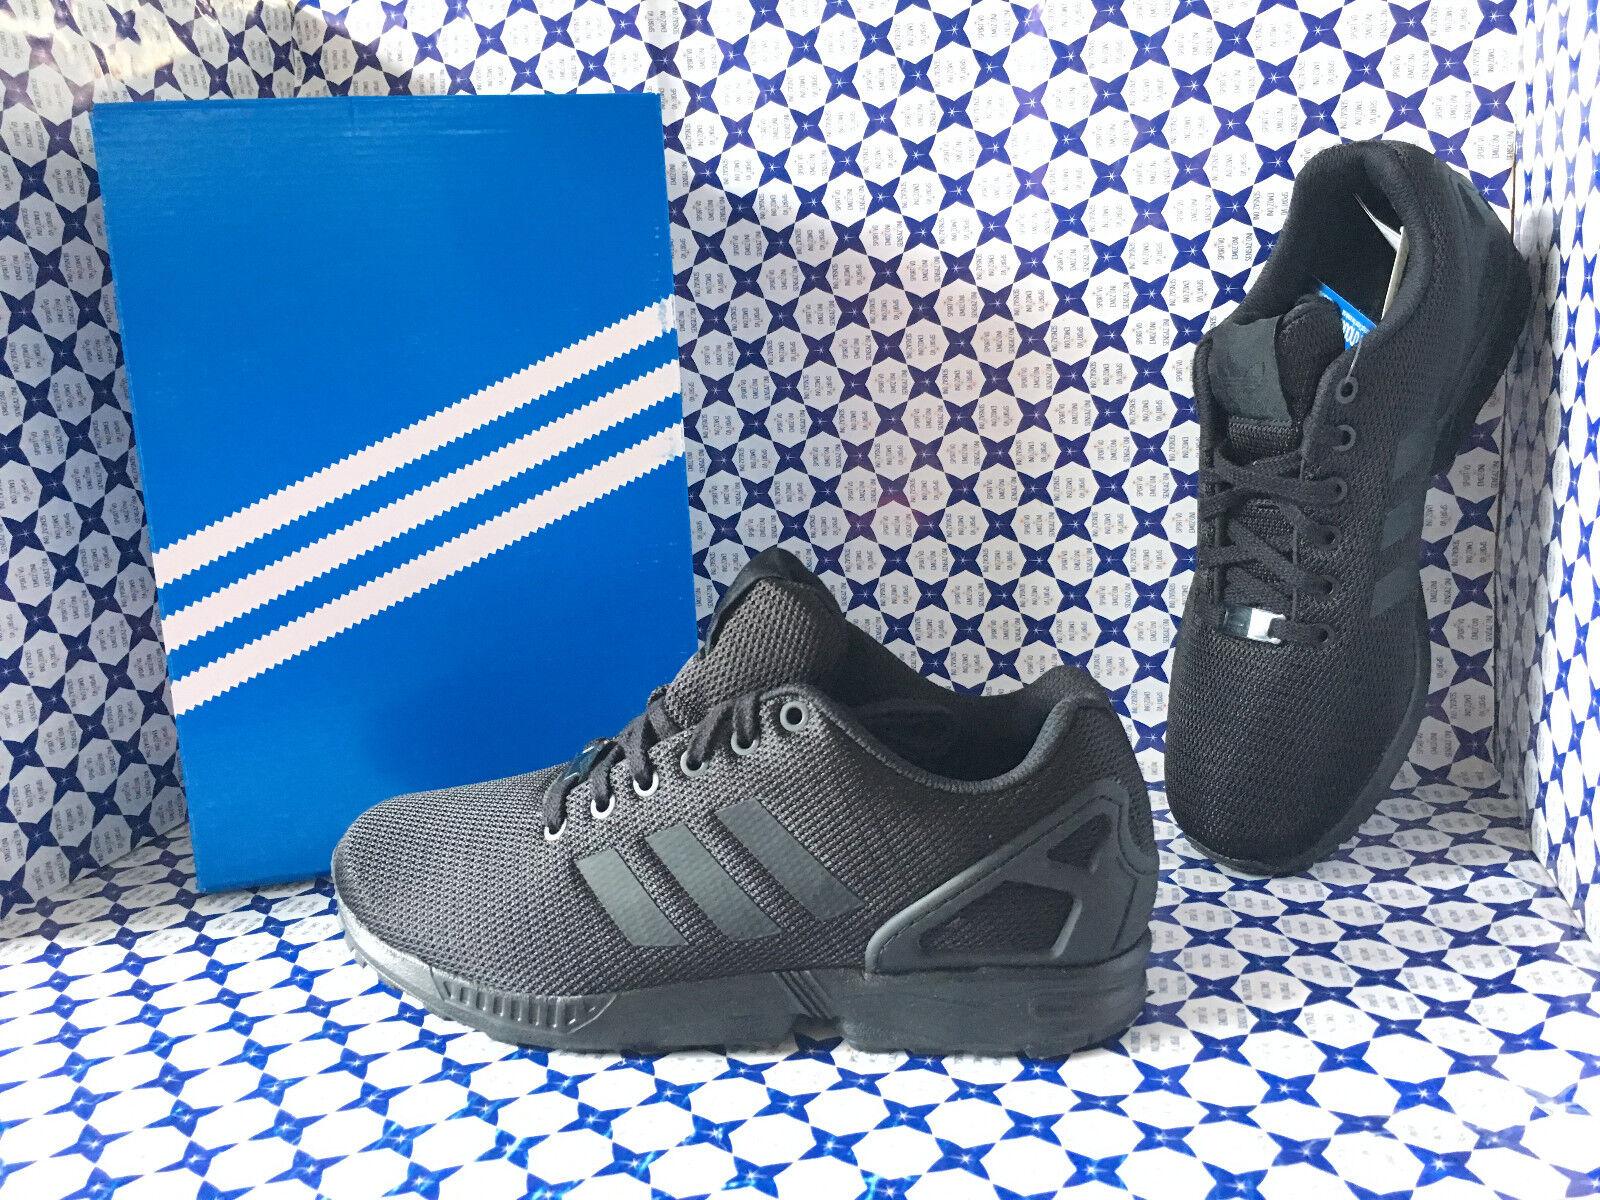 chaussures Adidas Originals ZX Flux hommes - baskets Jogging - noir - S32279